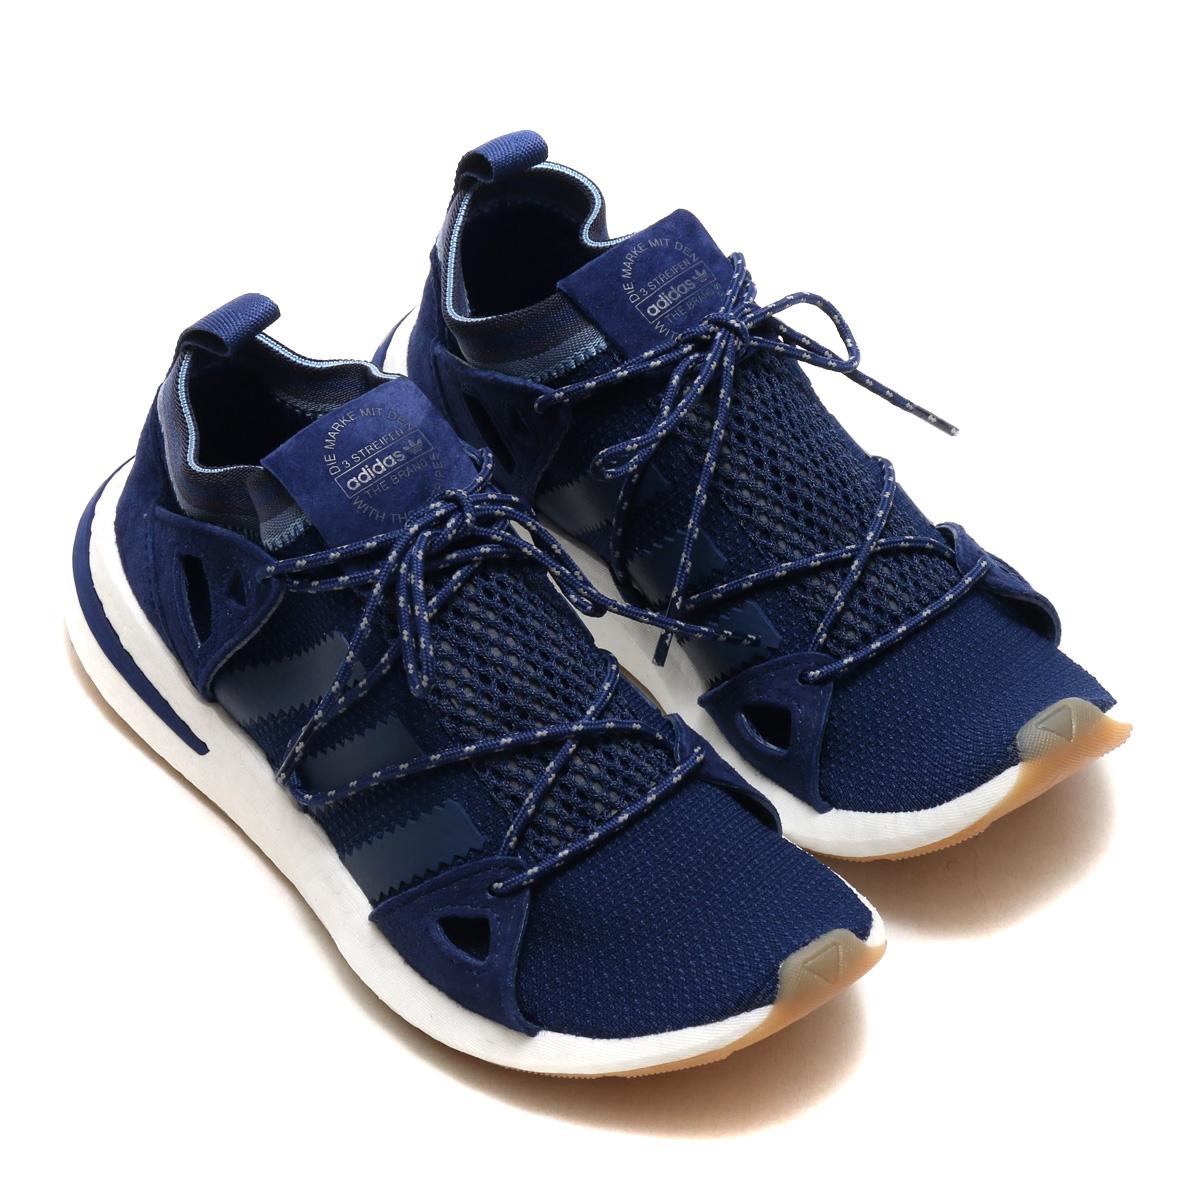 adidas Originals ARKYN W (アディダス オリジナルス アーキン W) Dark Blue/White/Gum【レディース スニーカー】18SS-S